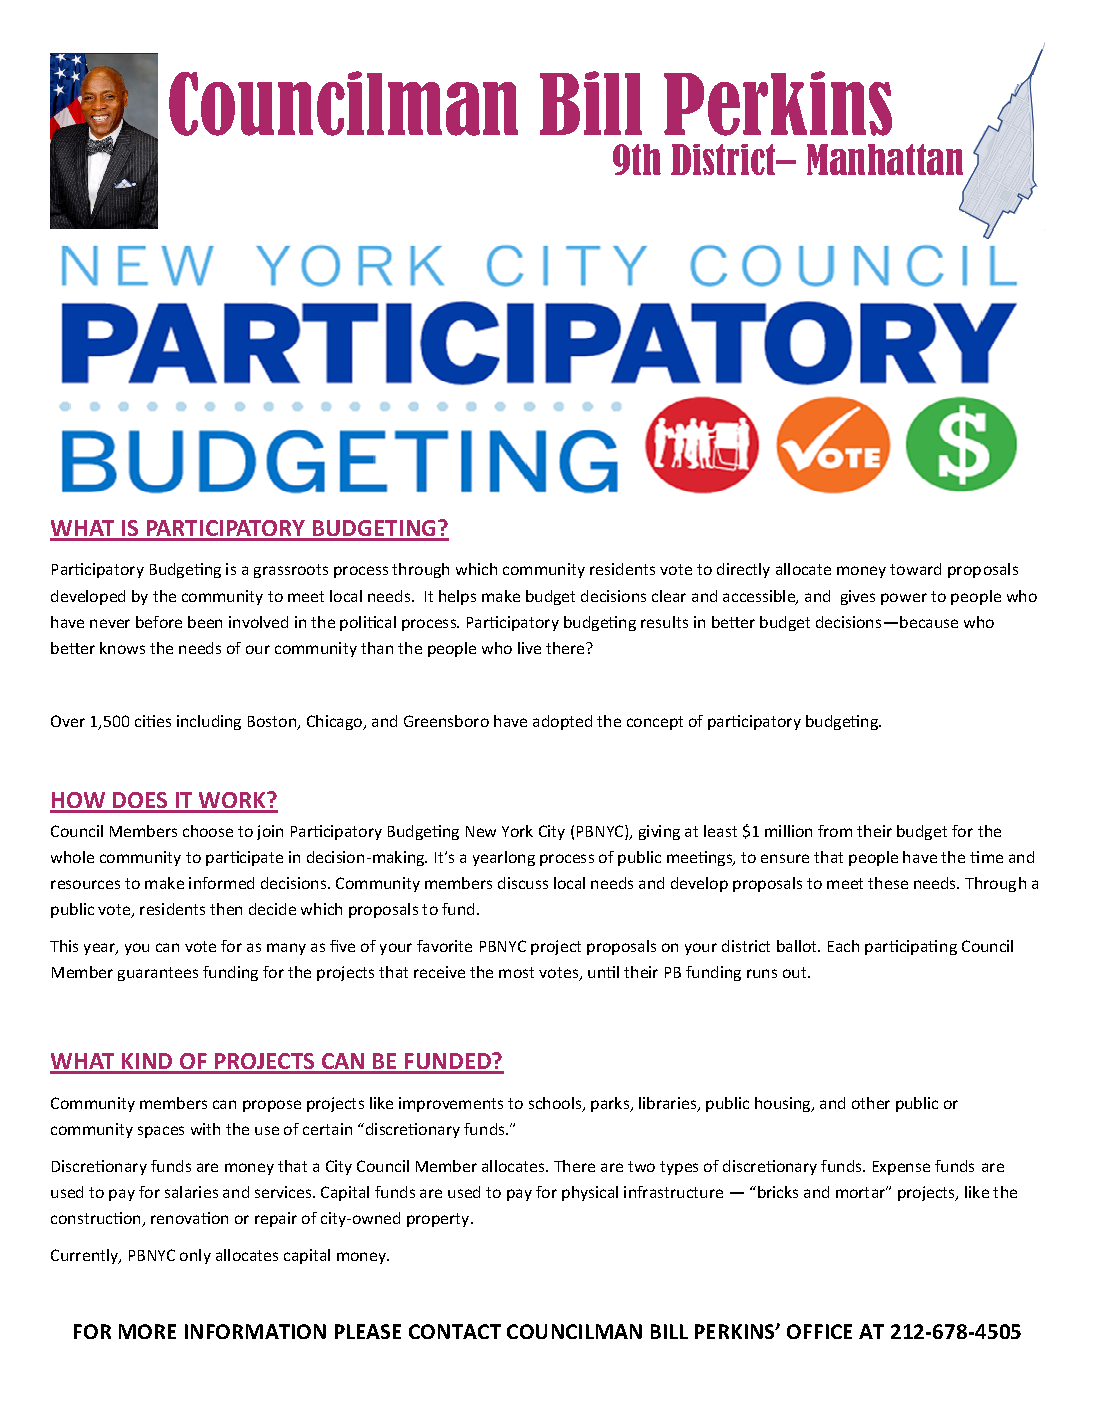 Harlem's Bill Perkins New York City Council Participatory Budgeting 2018